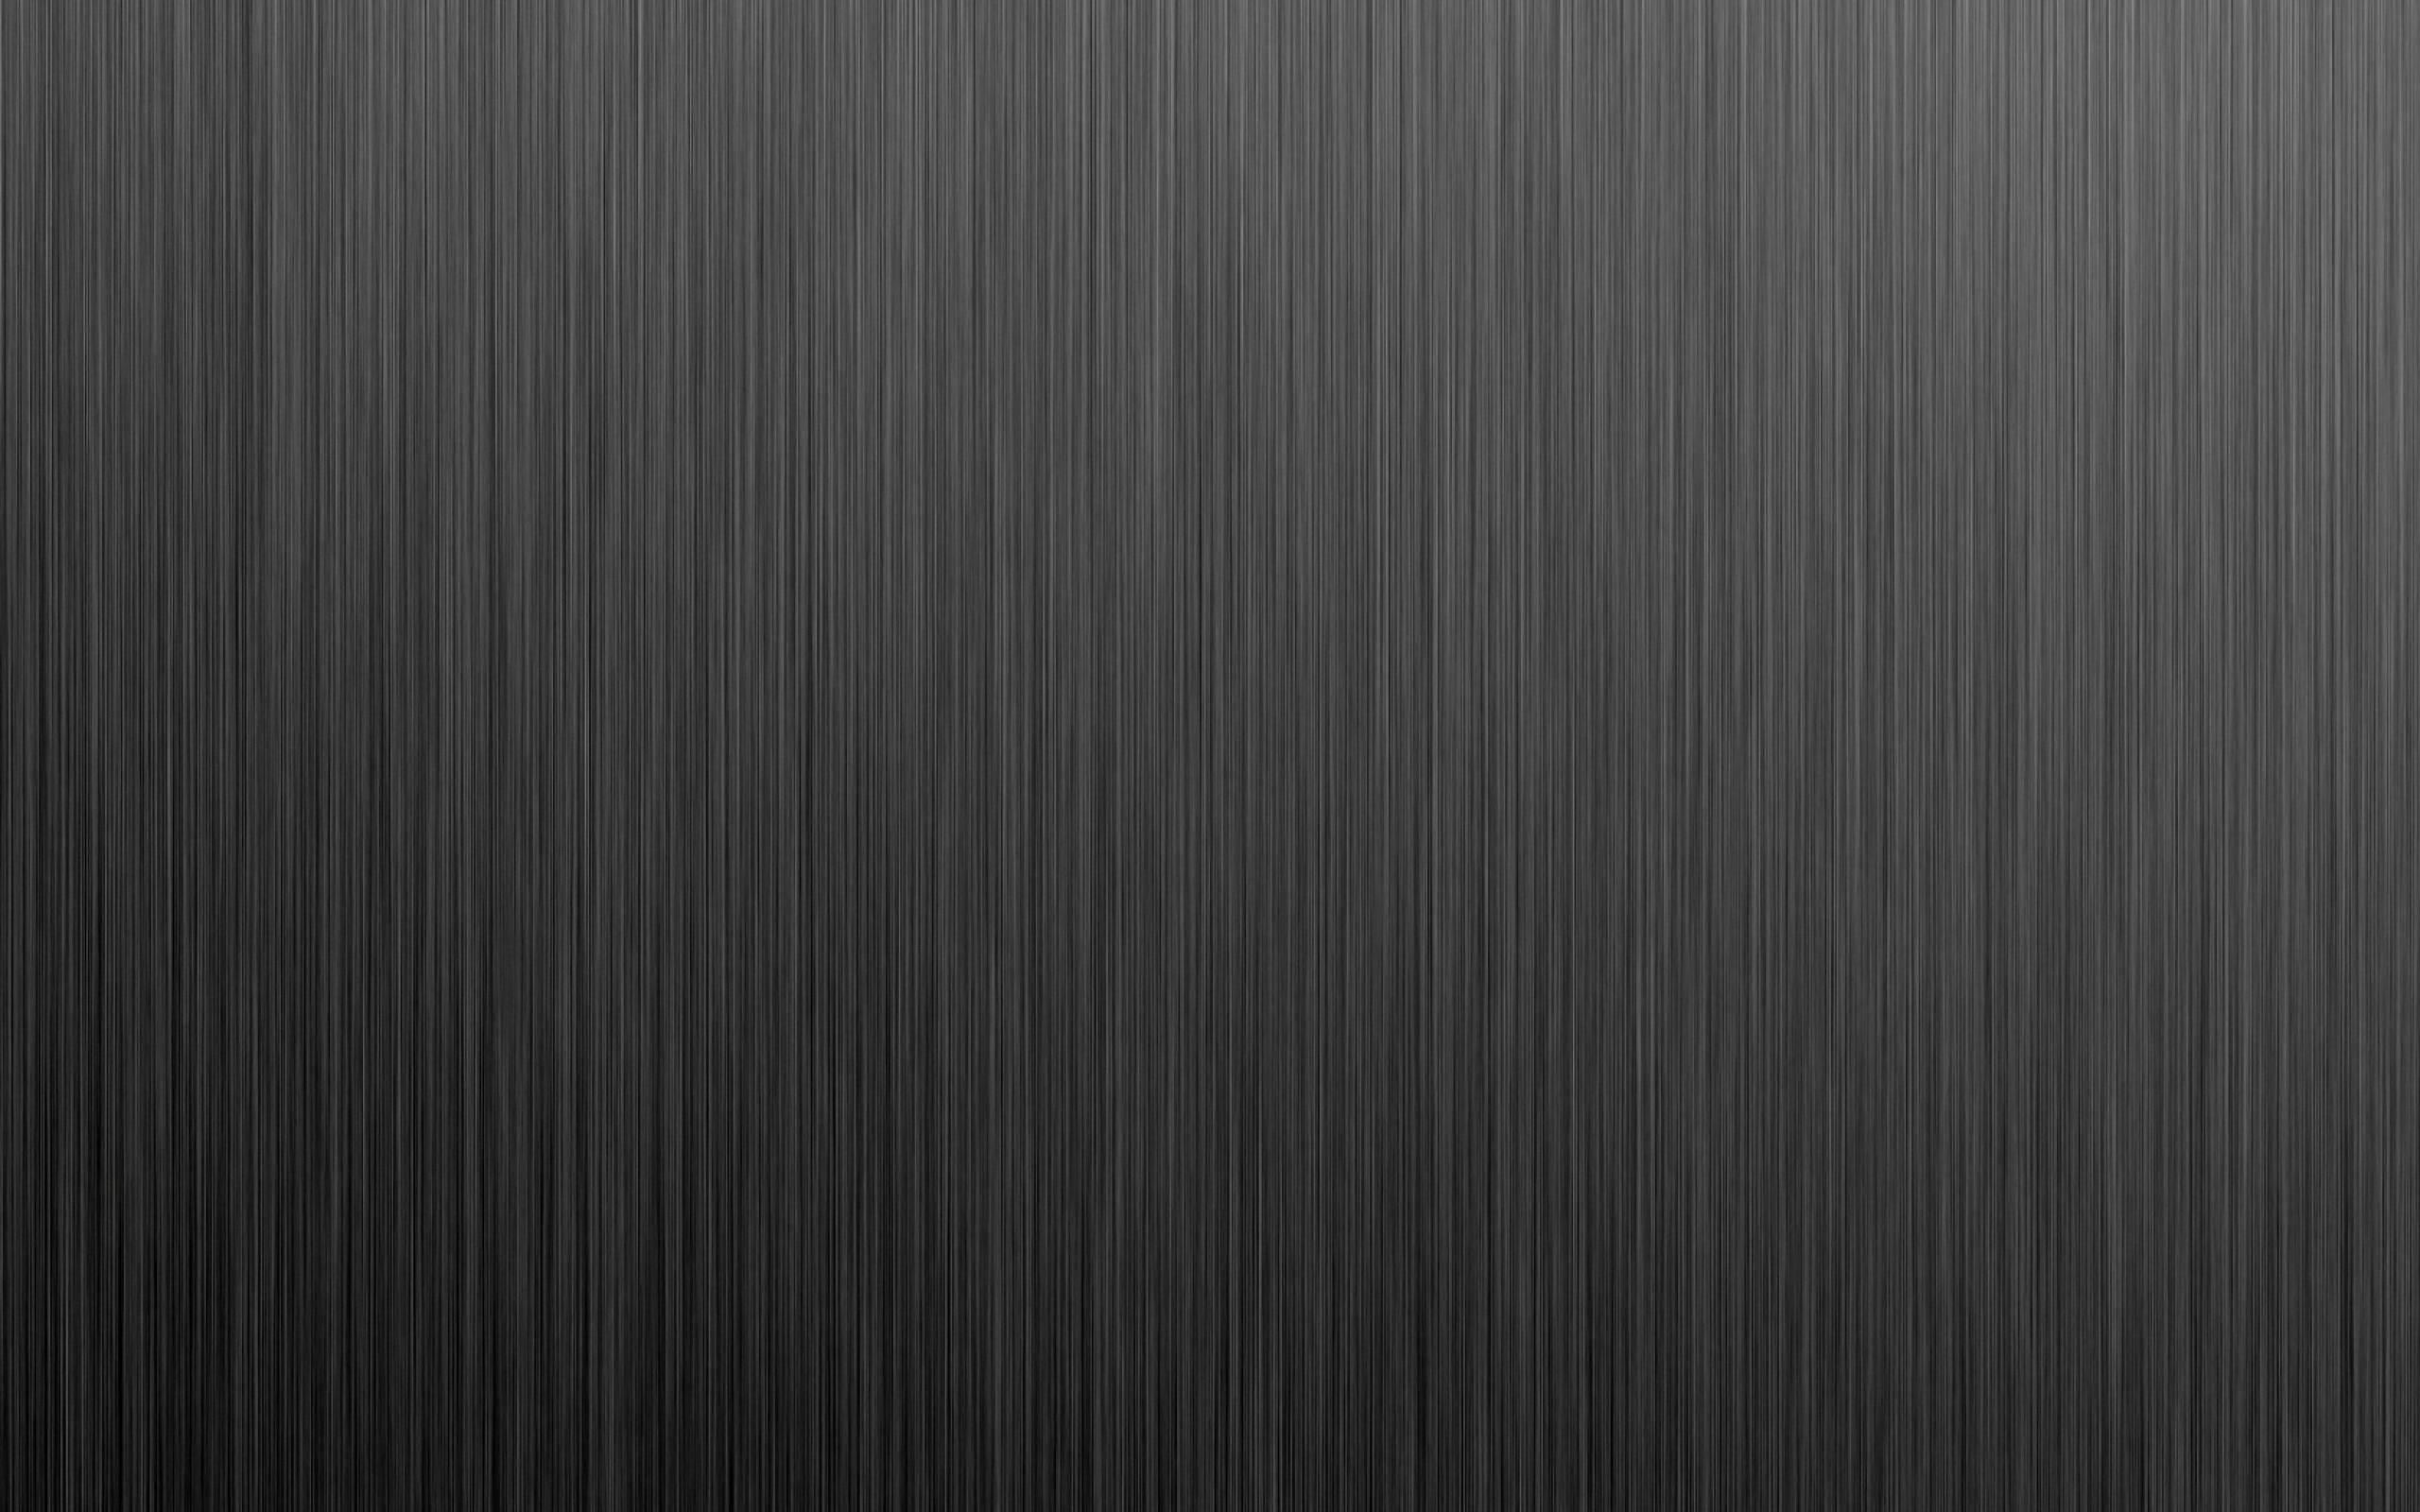 black hd background